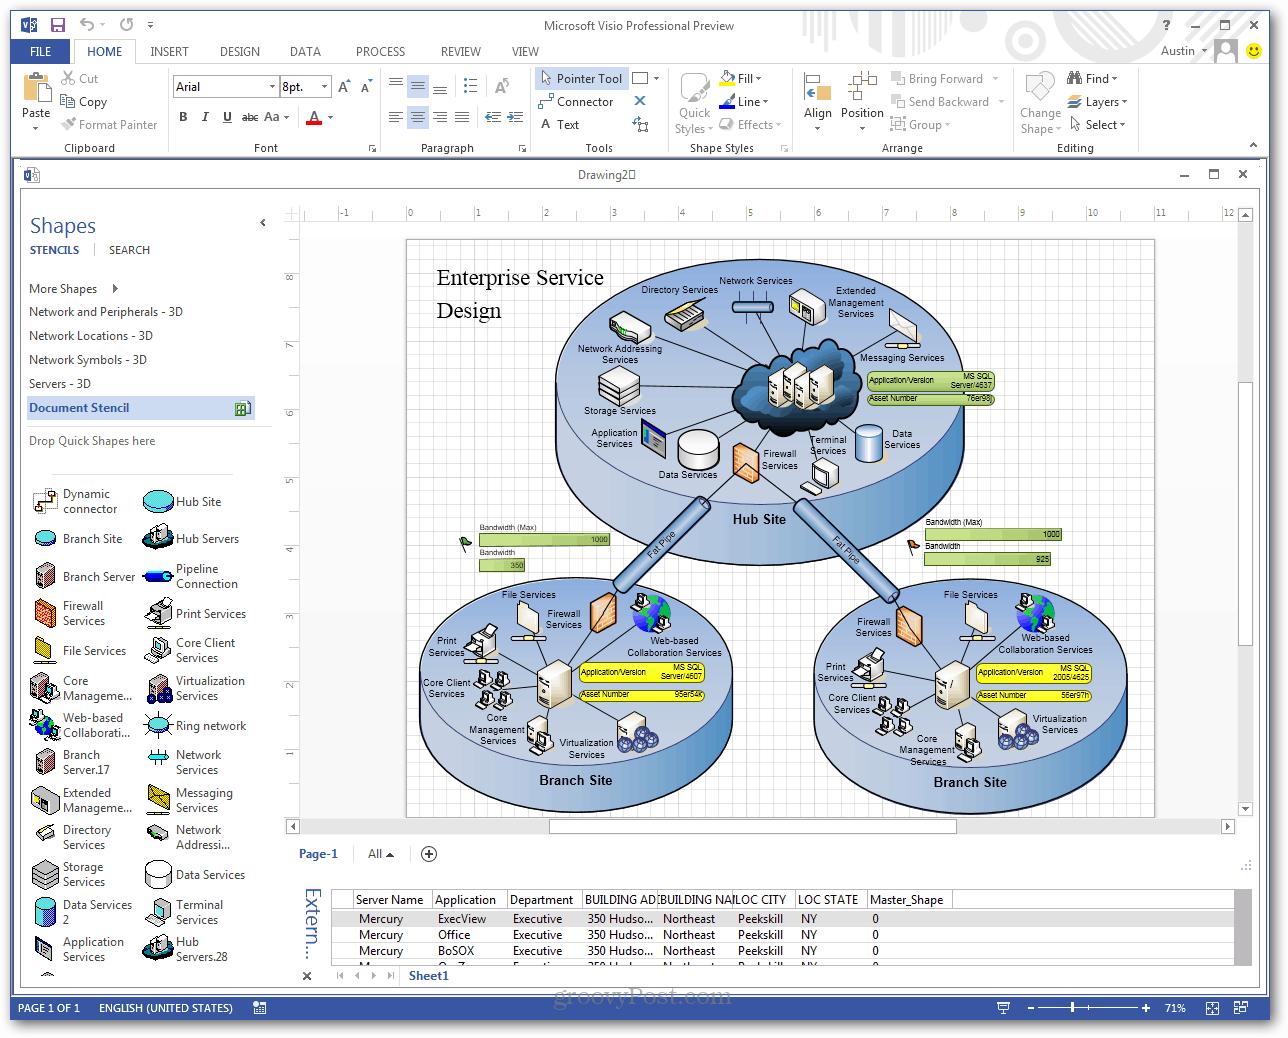 Image Gallery Microsoft Viso Unique Symbols Sequence Diagram Visio Network Diagram